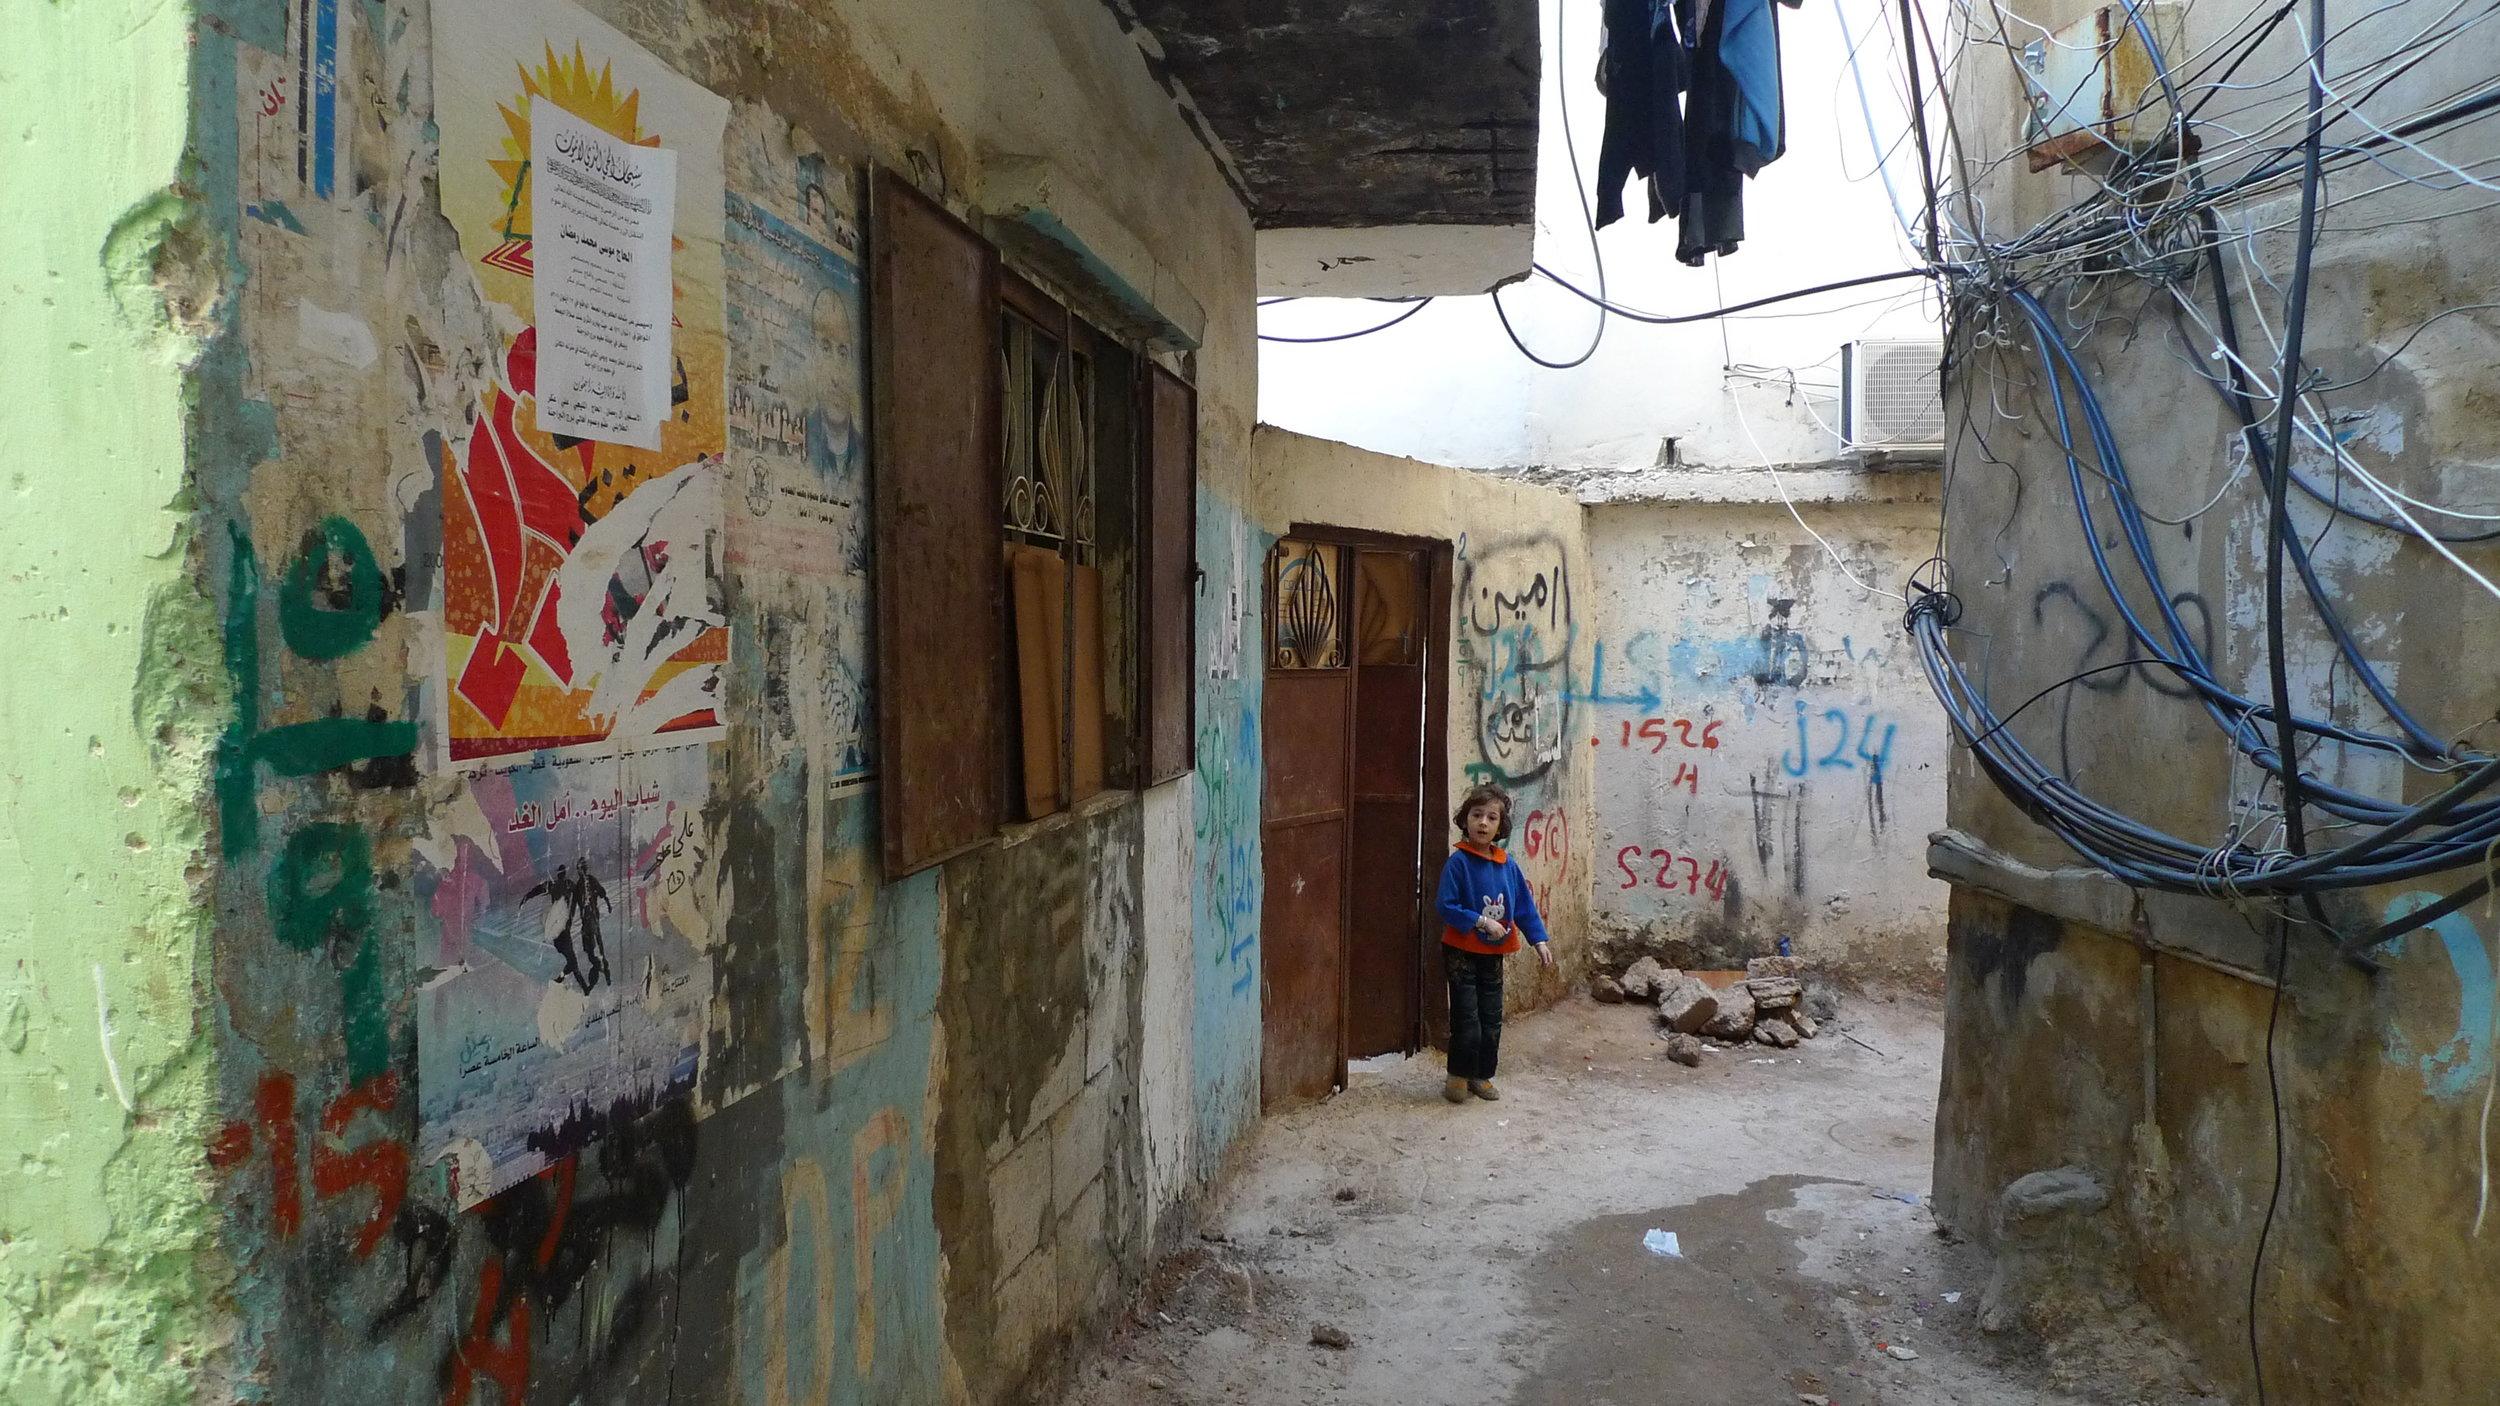 Kid_in_the_refugee_camp_of_Bourj_el-Barajneh_-_Flickr_-_Al_Jazeera_English.jpg